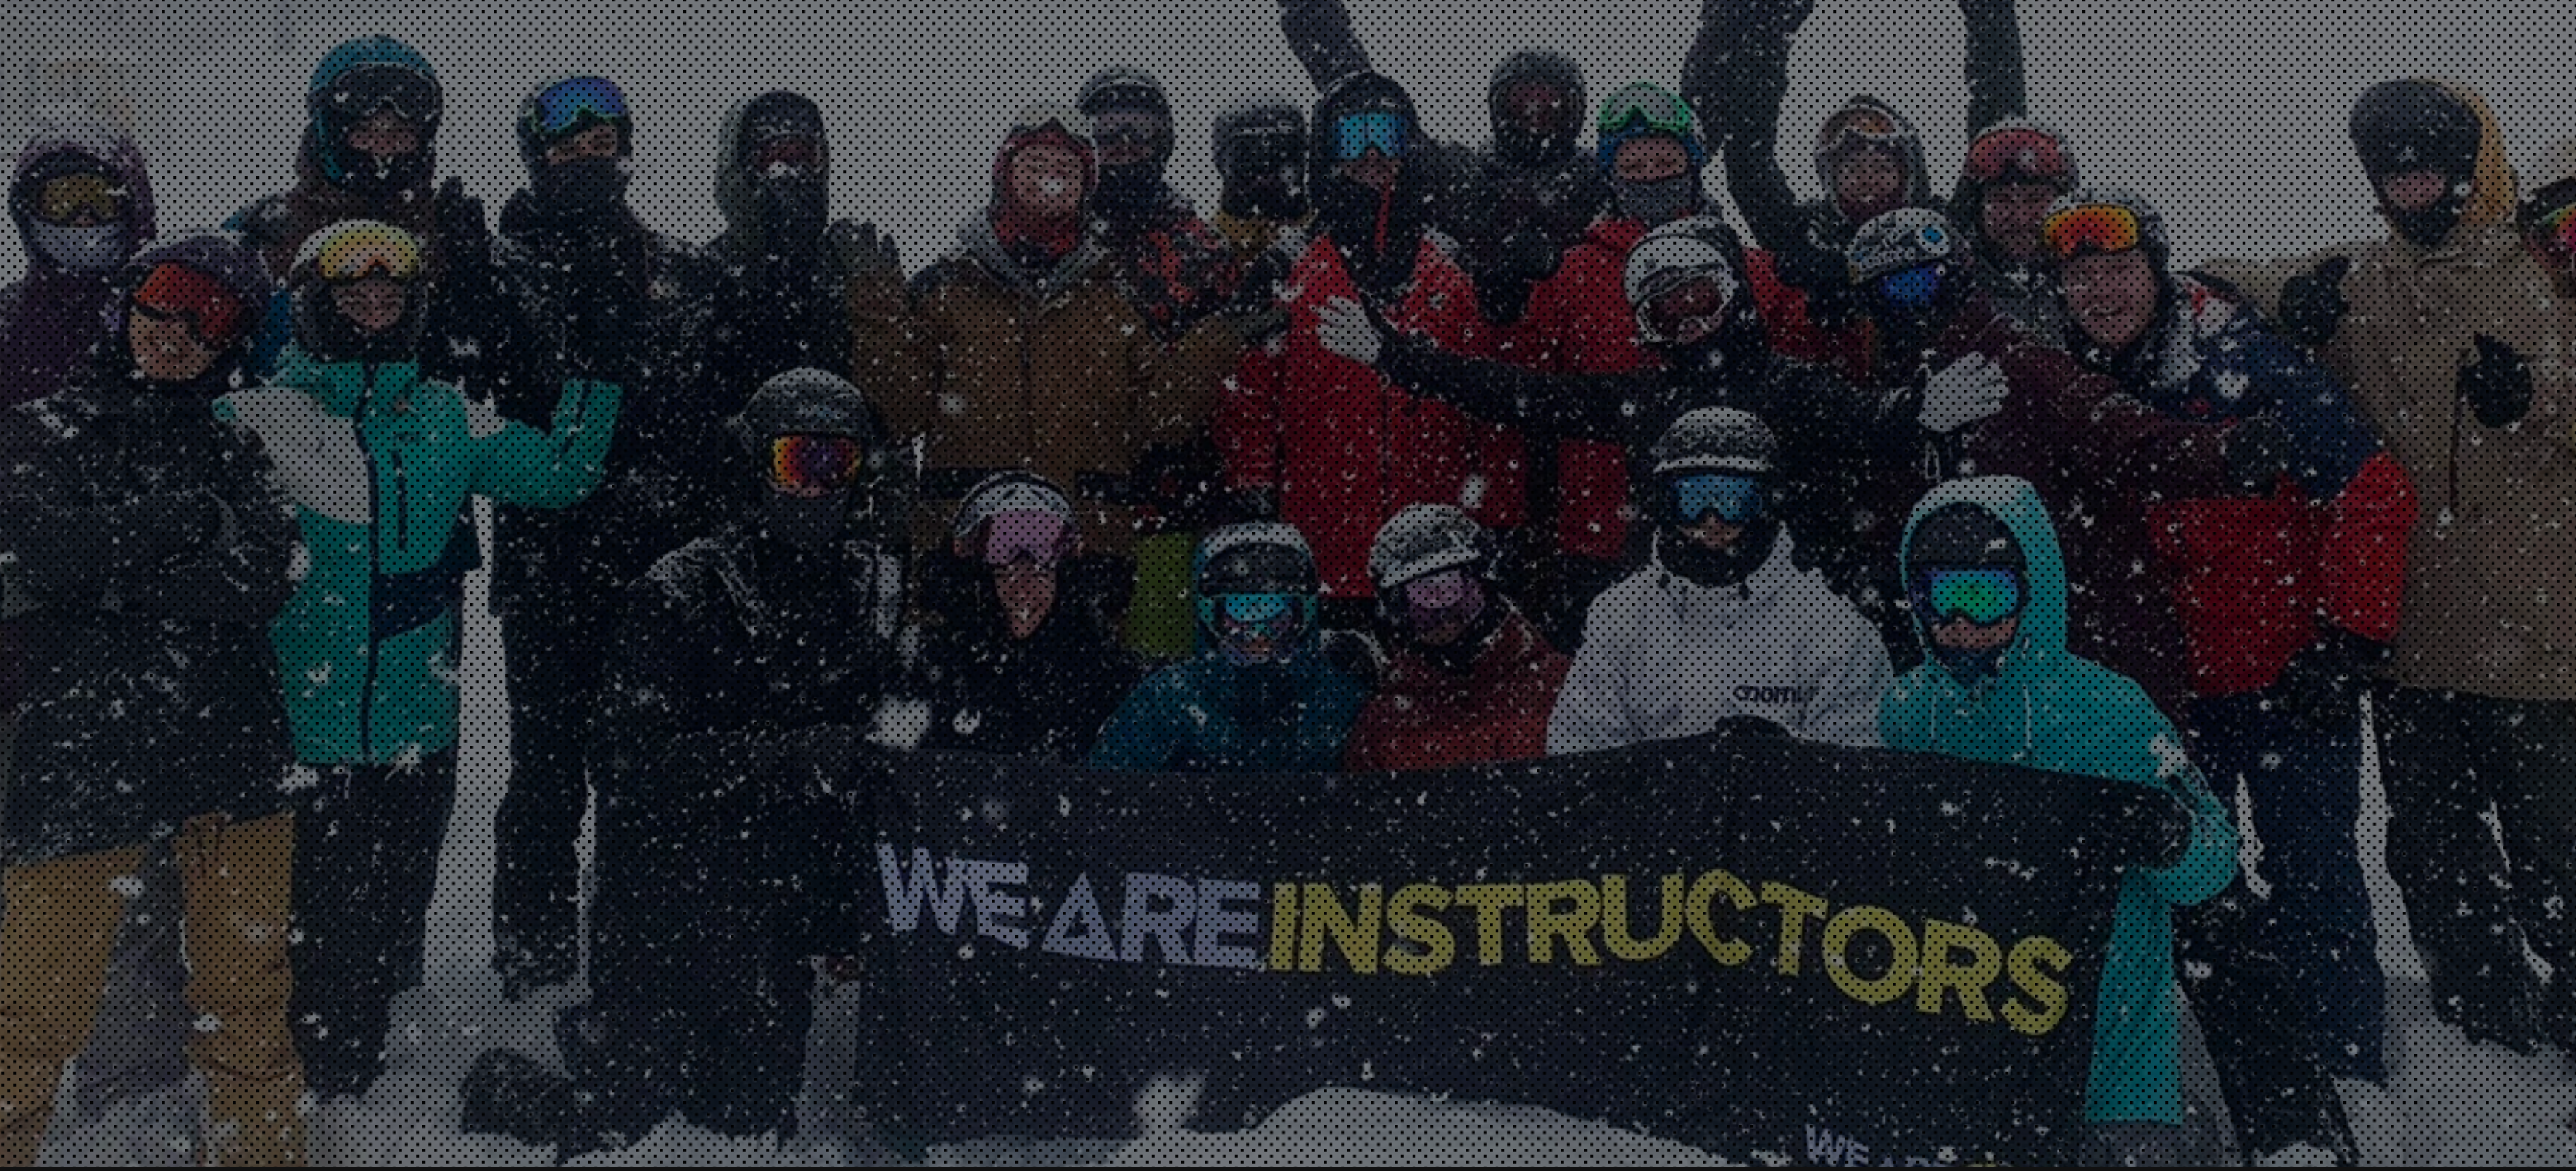 Ski Instructor Internship Gap Year